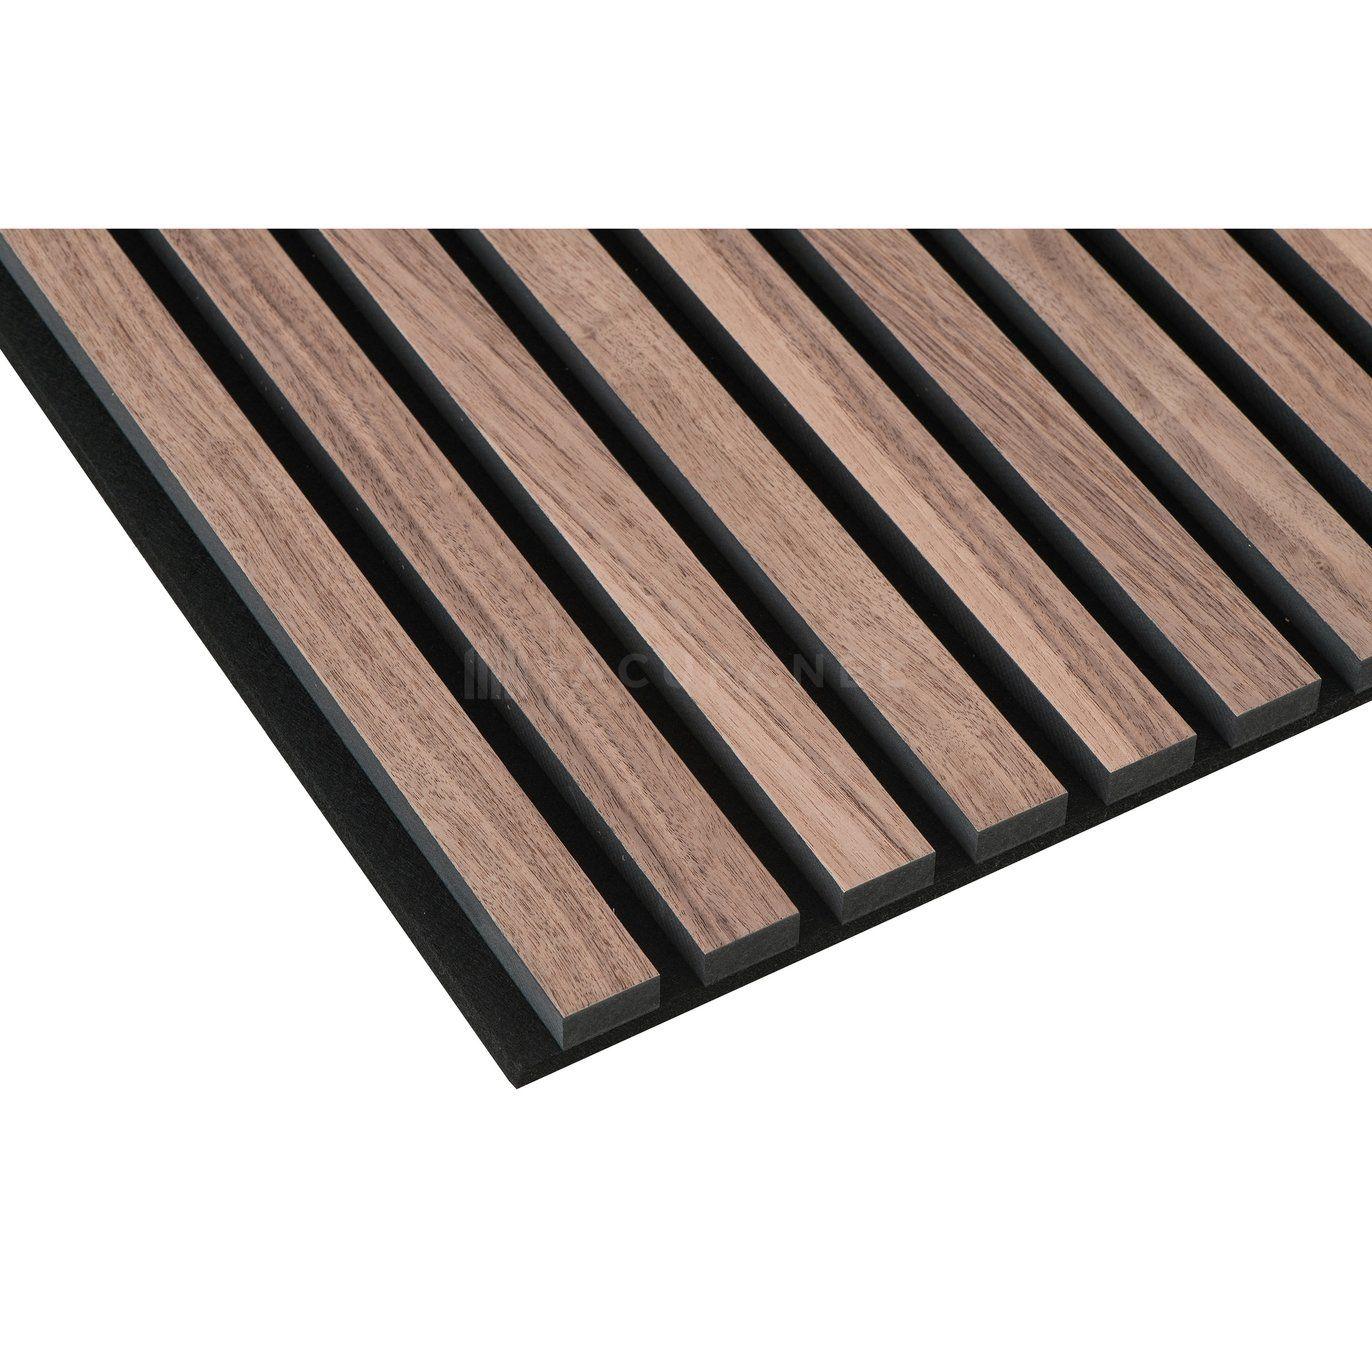 Acupanel Natural Walnut Acoustic Slat Wood Wall Panels   Wood ...